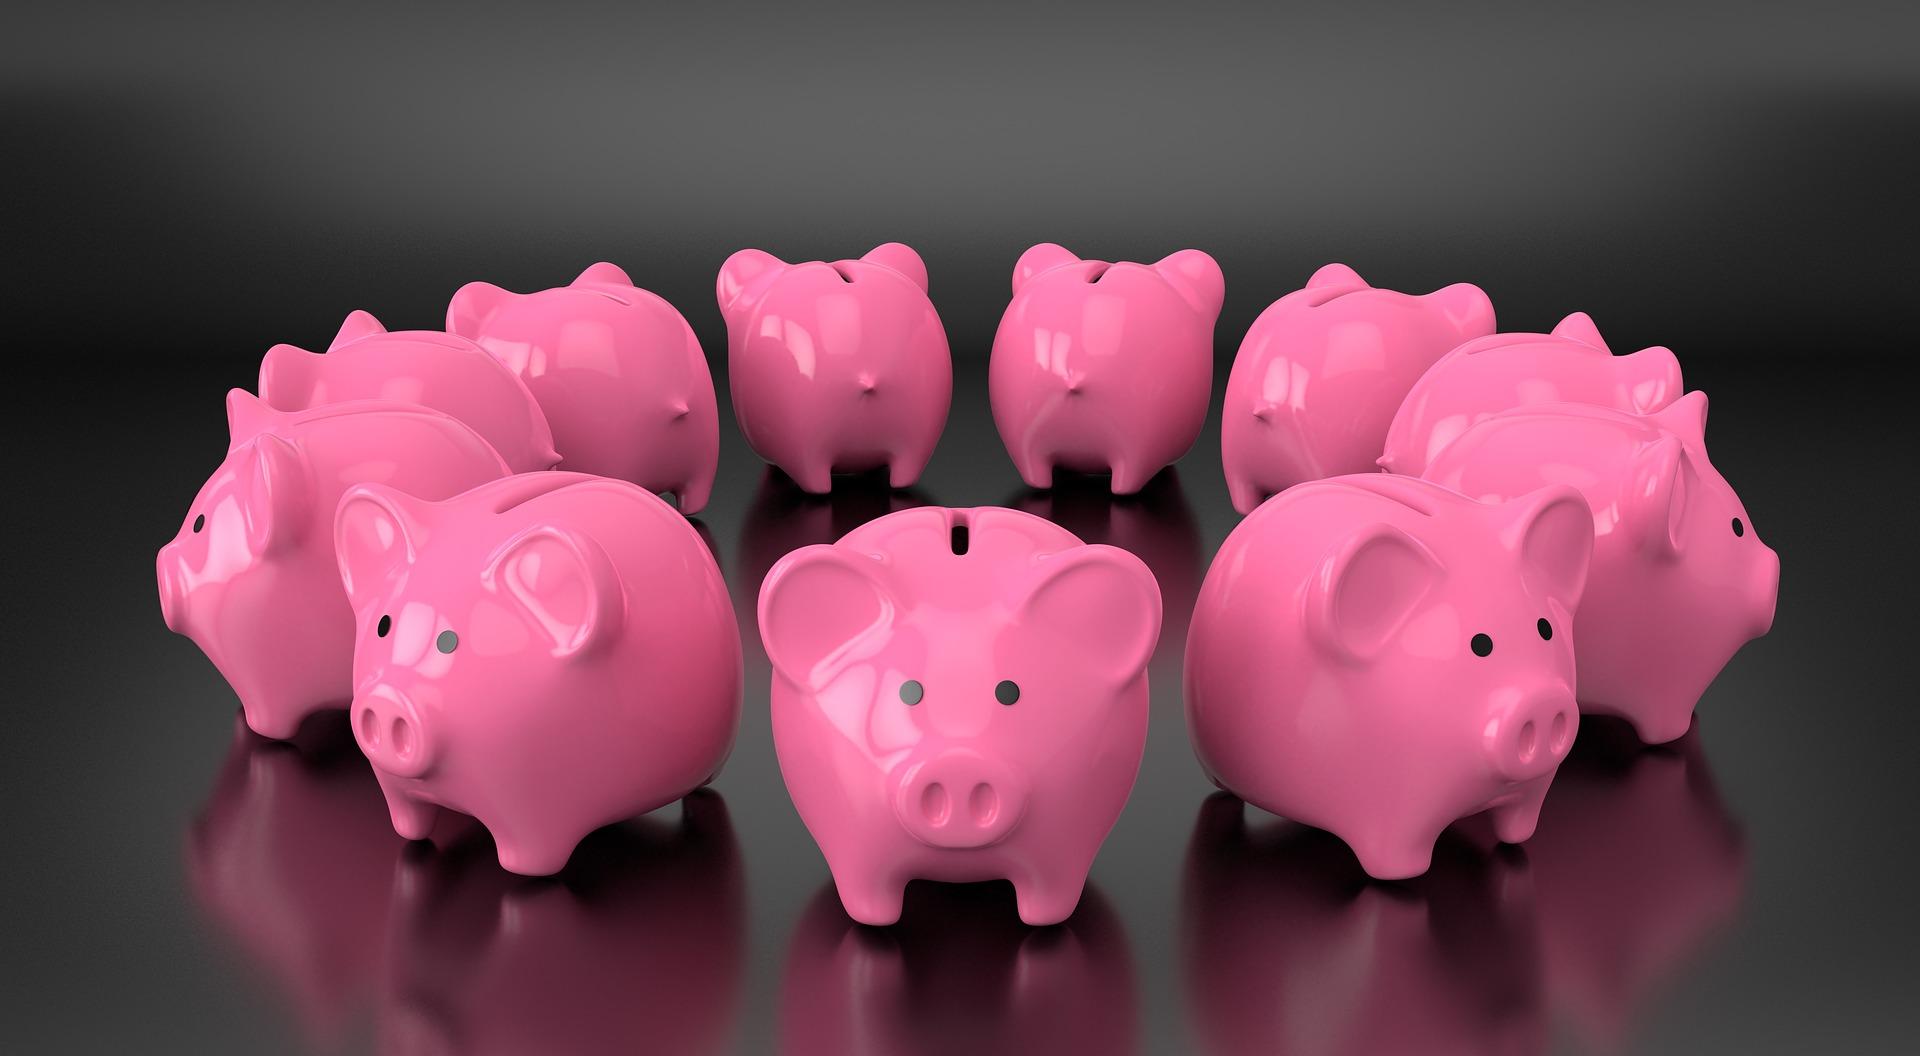 average household's savings